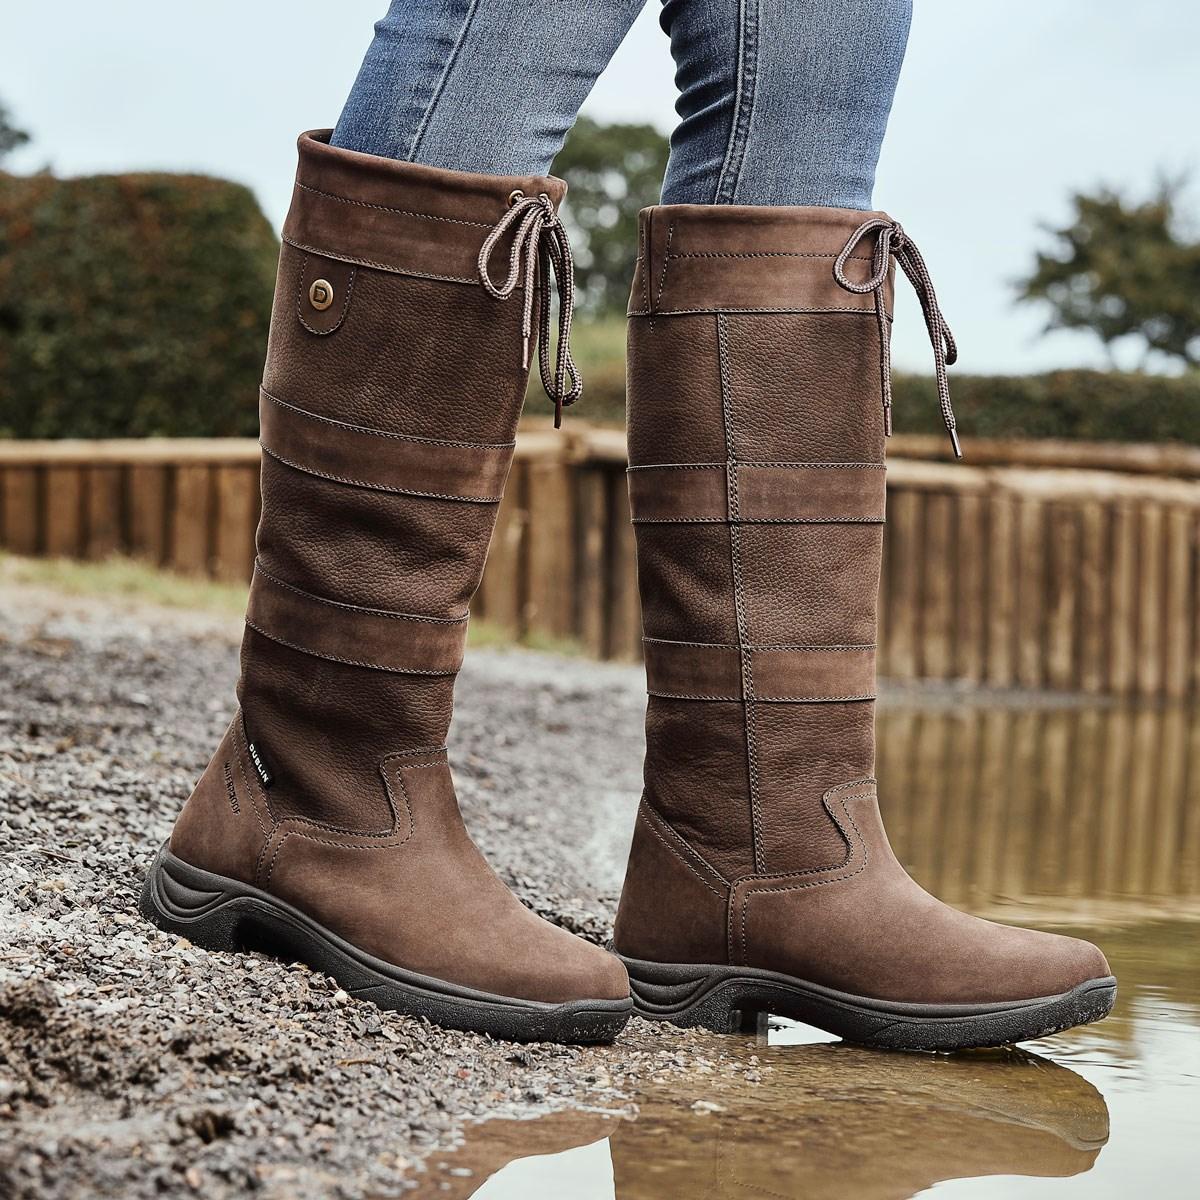 1b7f9db1f8 Dublin River III Country Boots - Chocolate